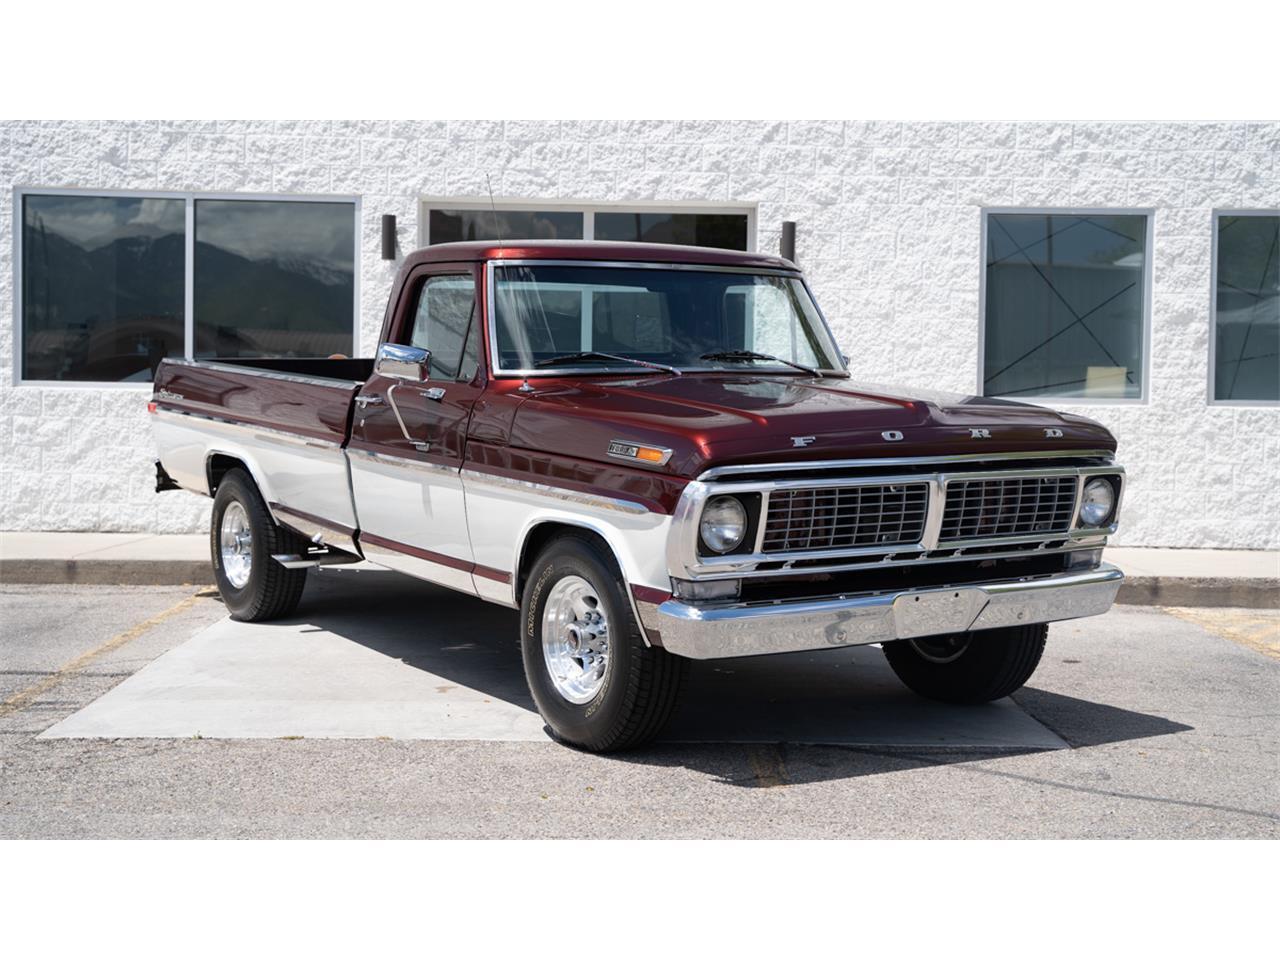 1970 Ford F250 (CC-1354594) for sale in Salt Lake City, Utah